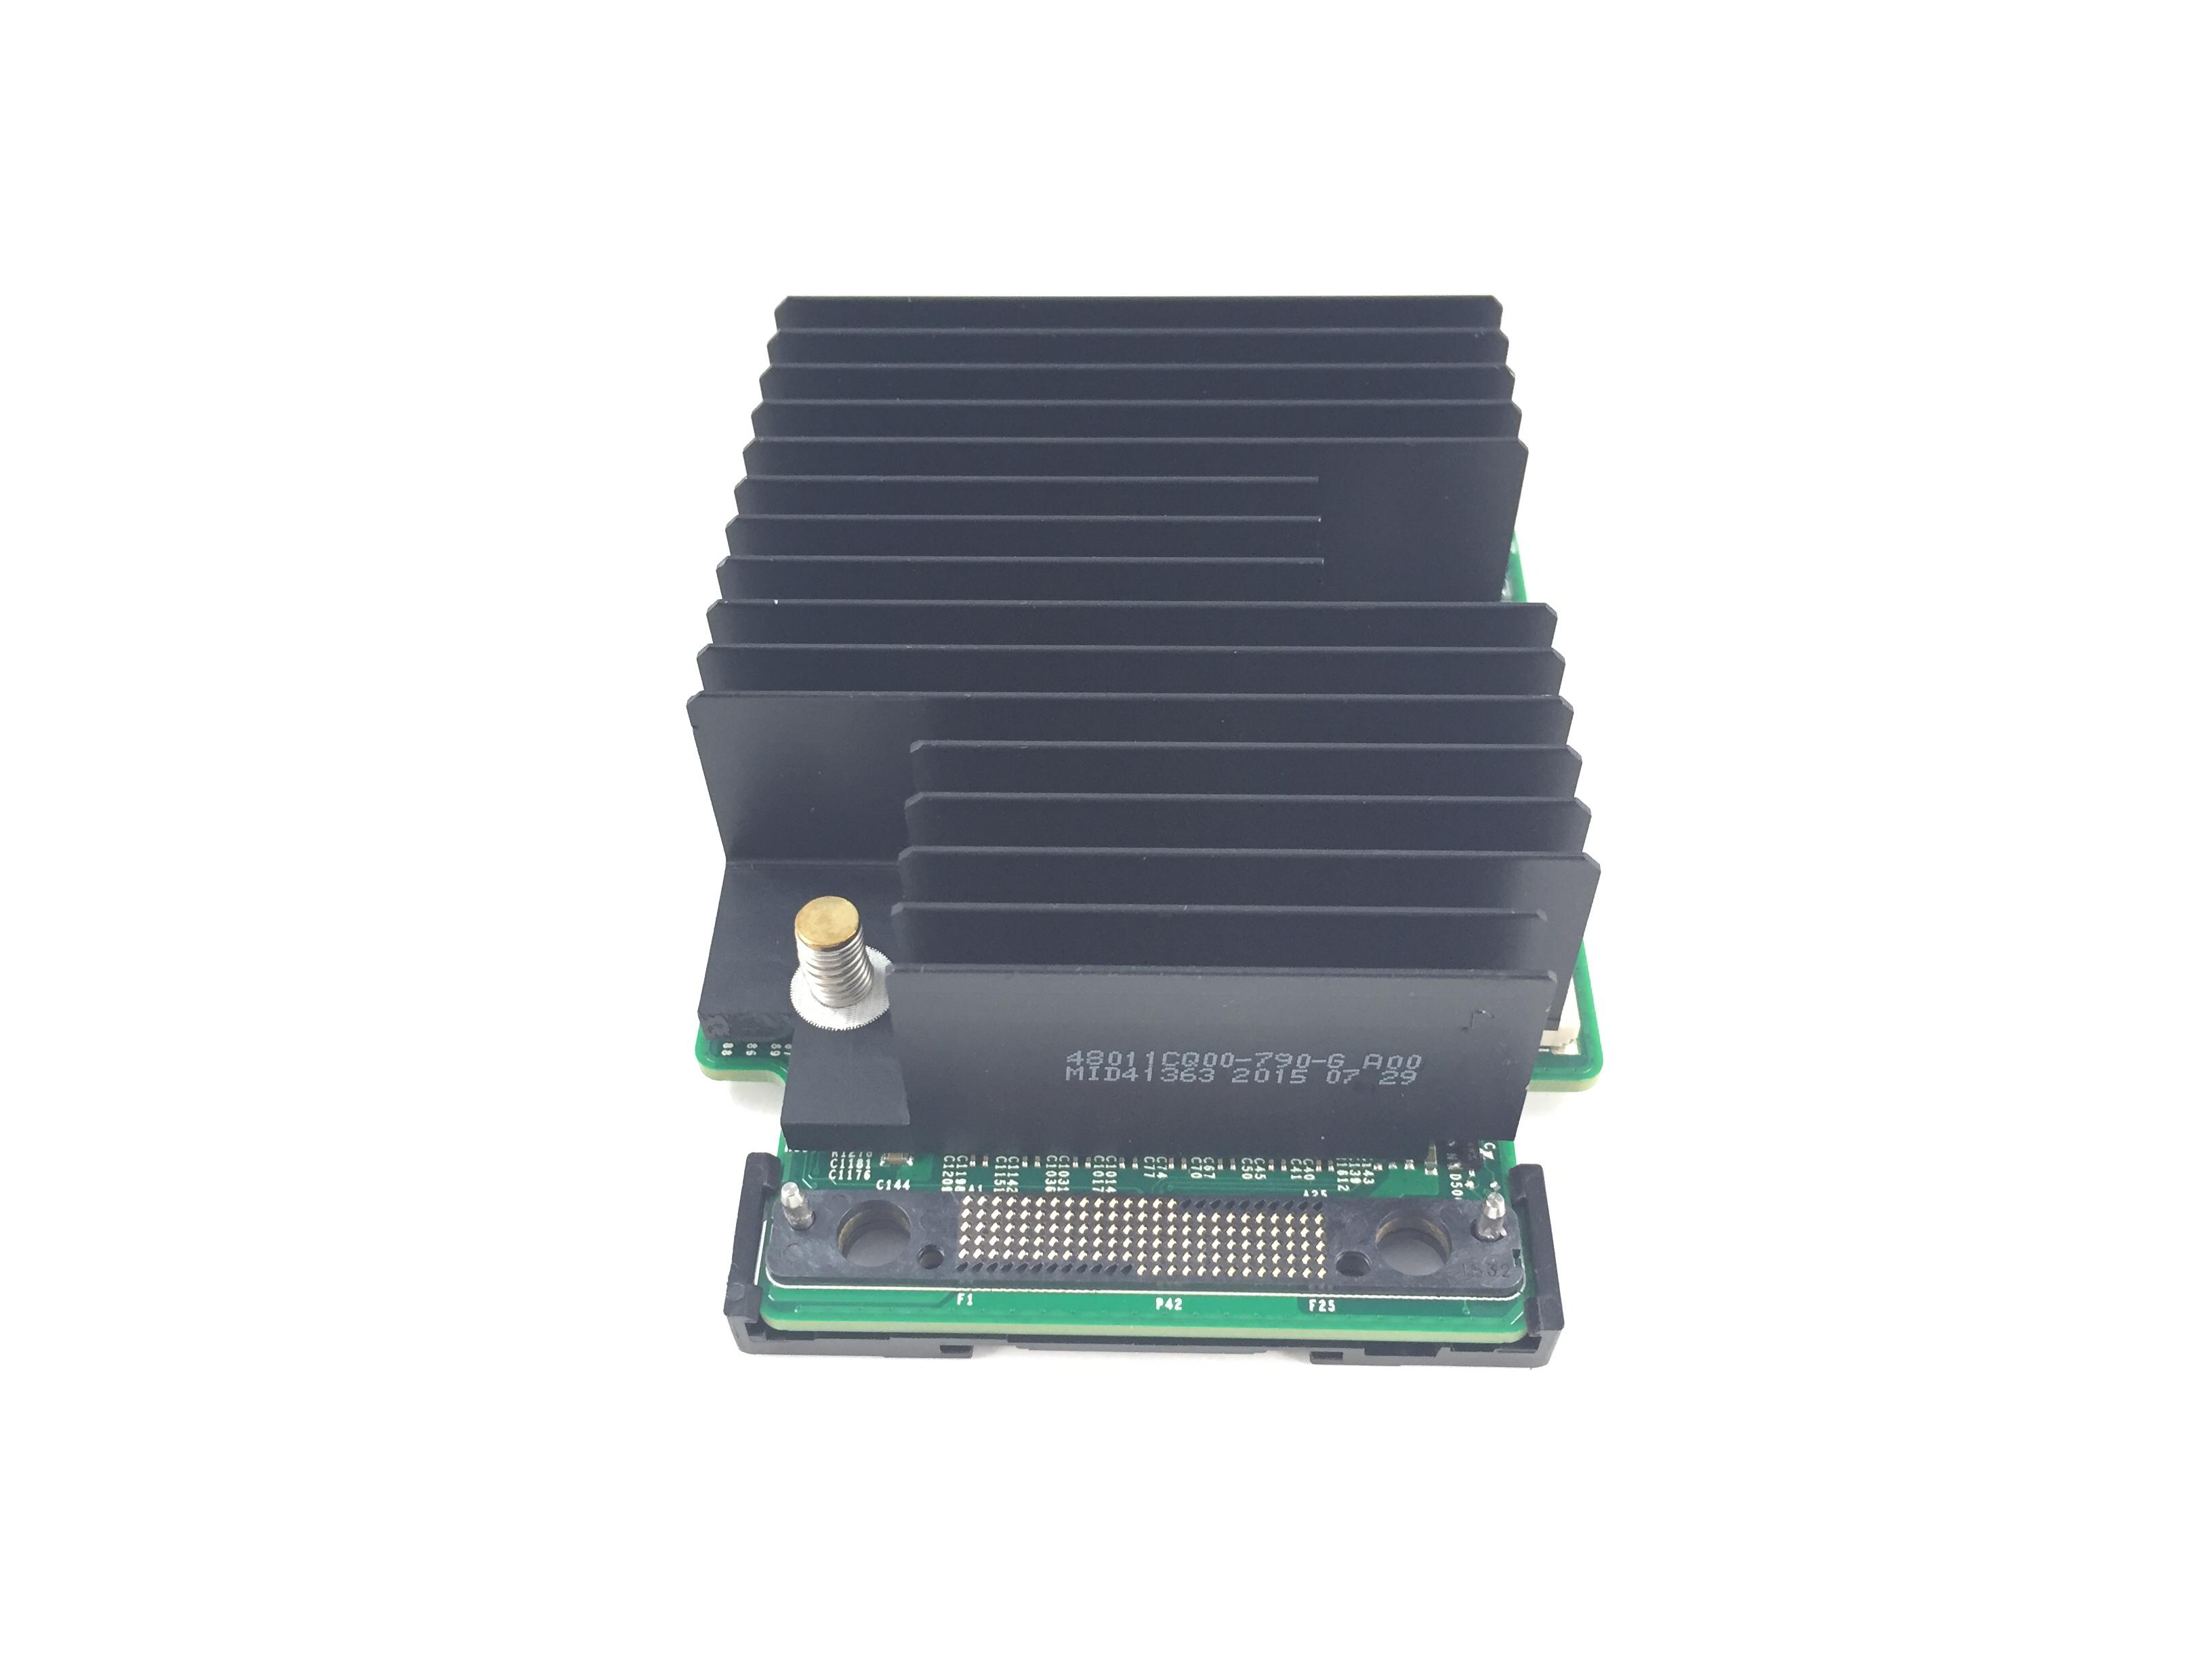 DELL PERC H330 MINI MONO 12GBPS SAS/SATA RAID CONTROLLER (0GDJ3J)